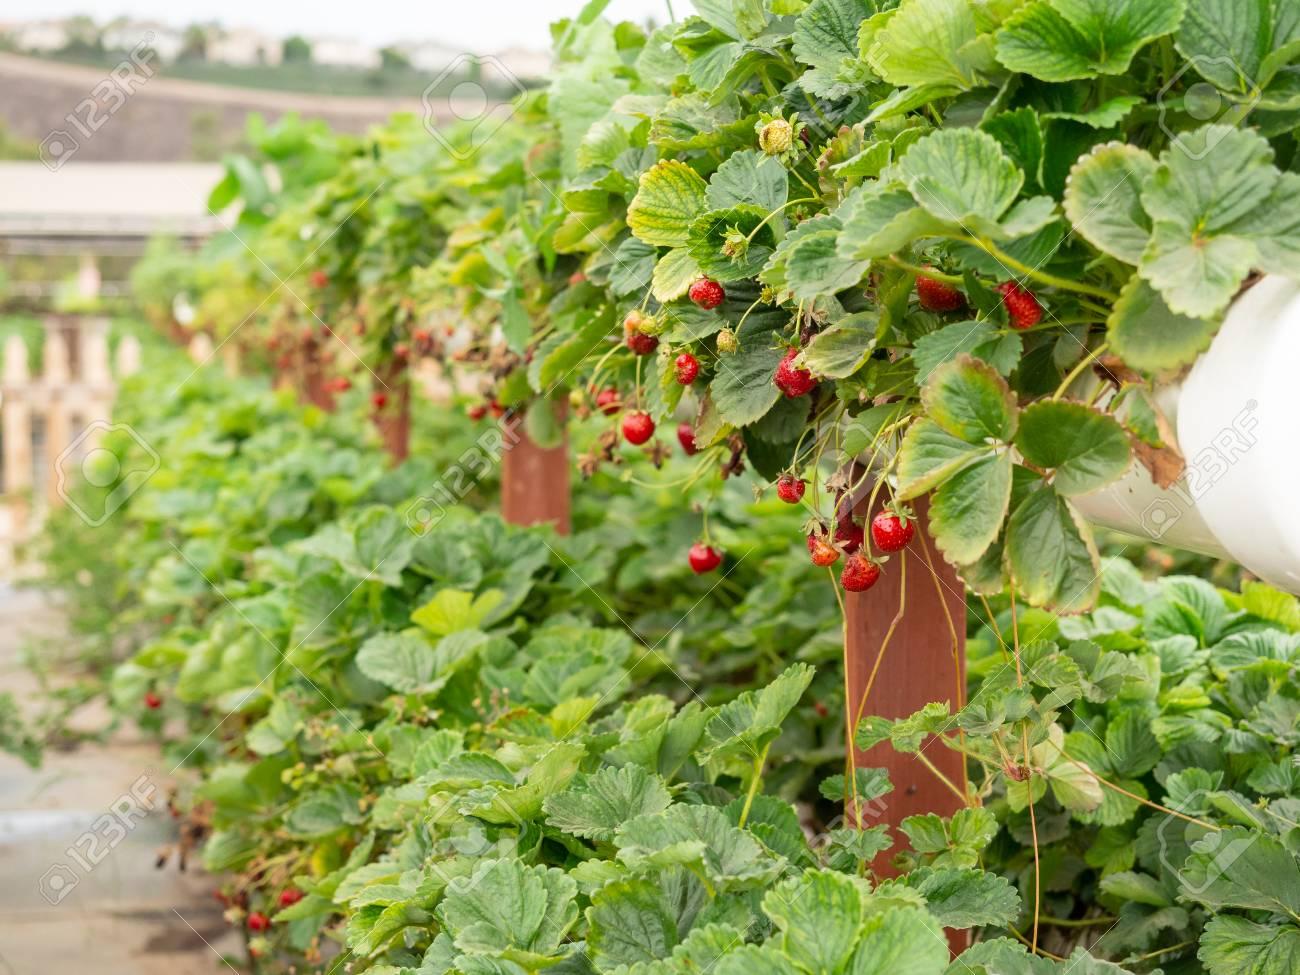 Organic strawberry growing on hydroponic farm outside - 115343664